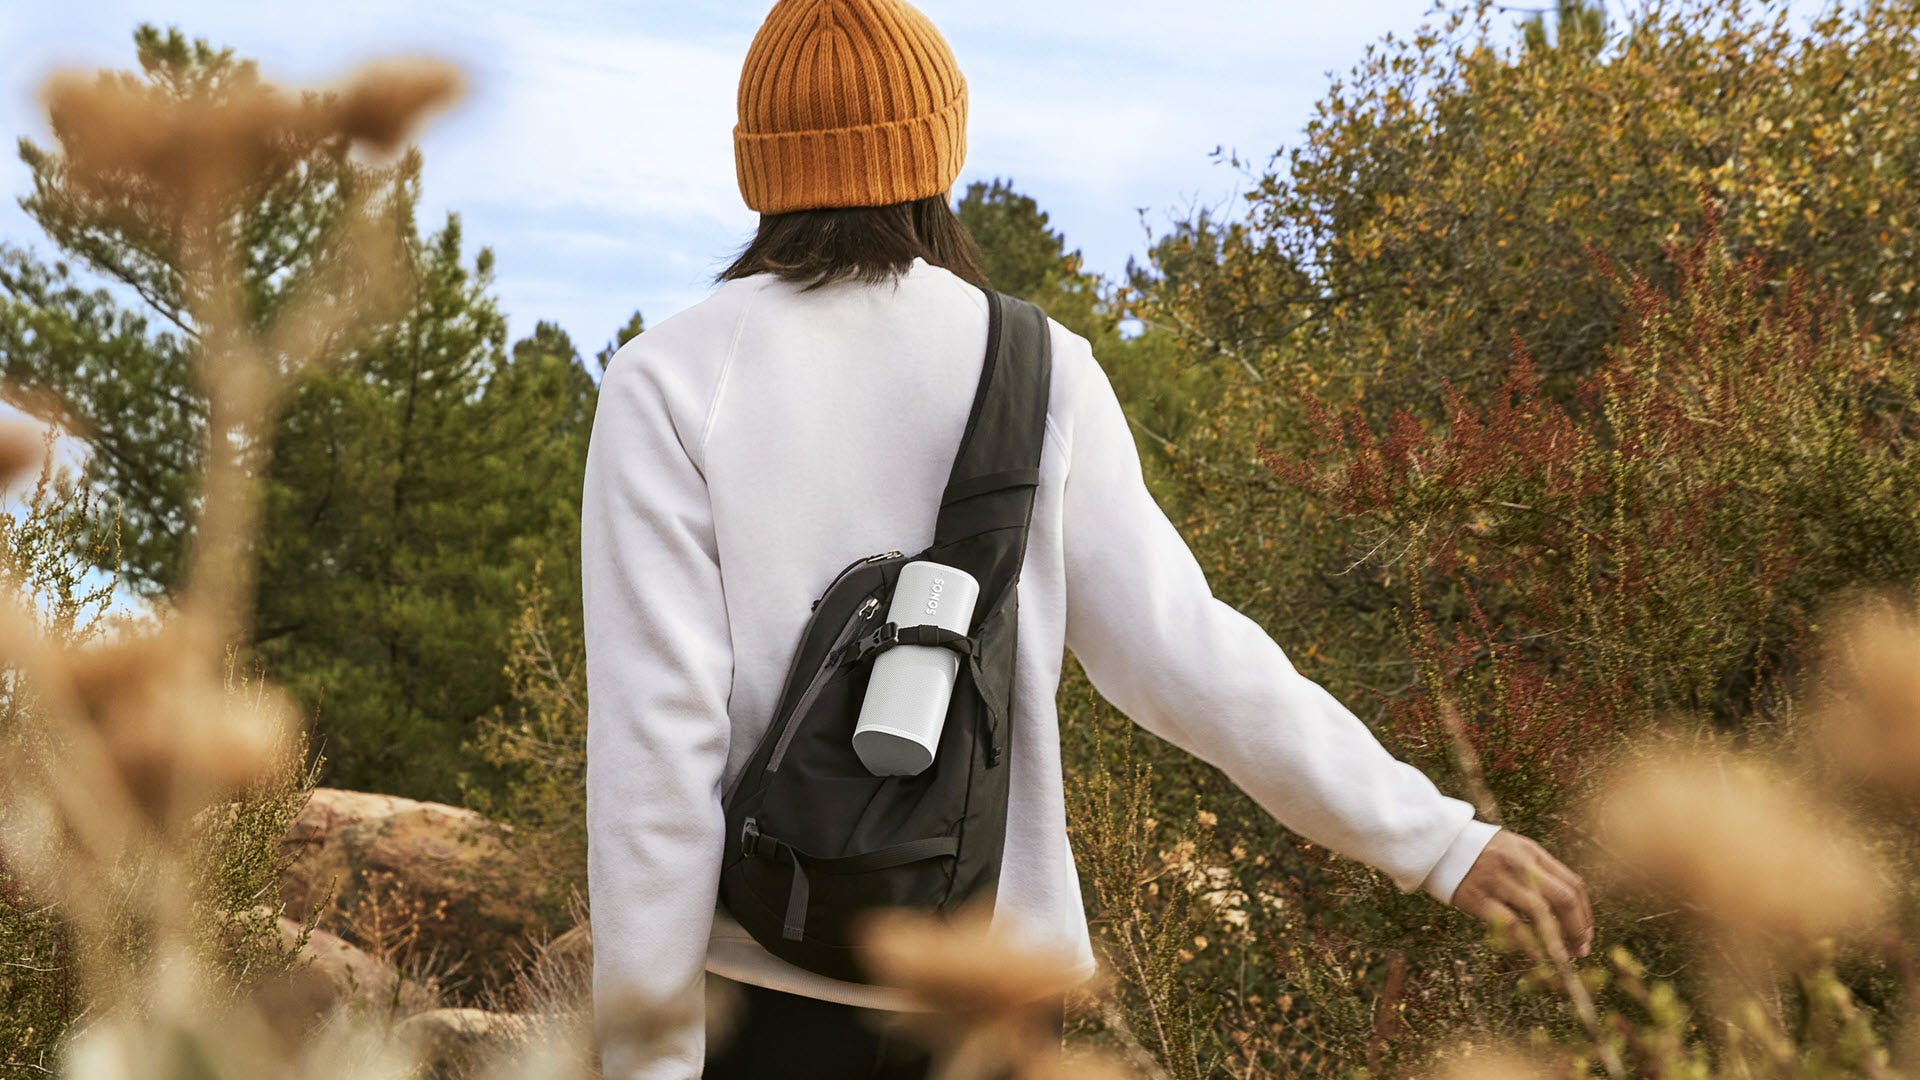 A Sonos Roam speaker strapped to a sling bag.